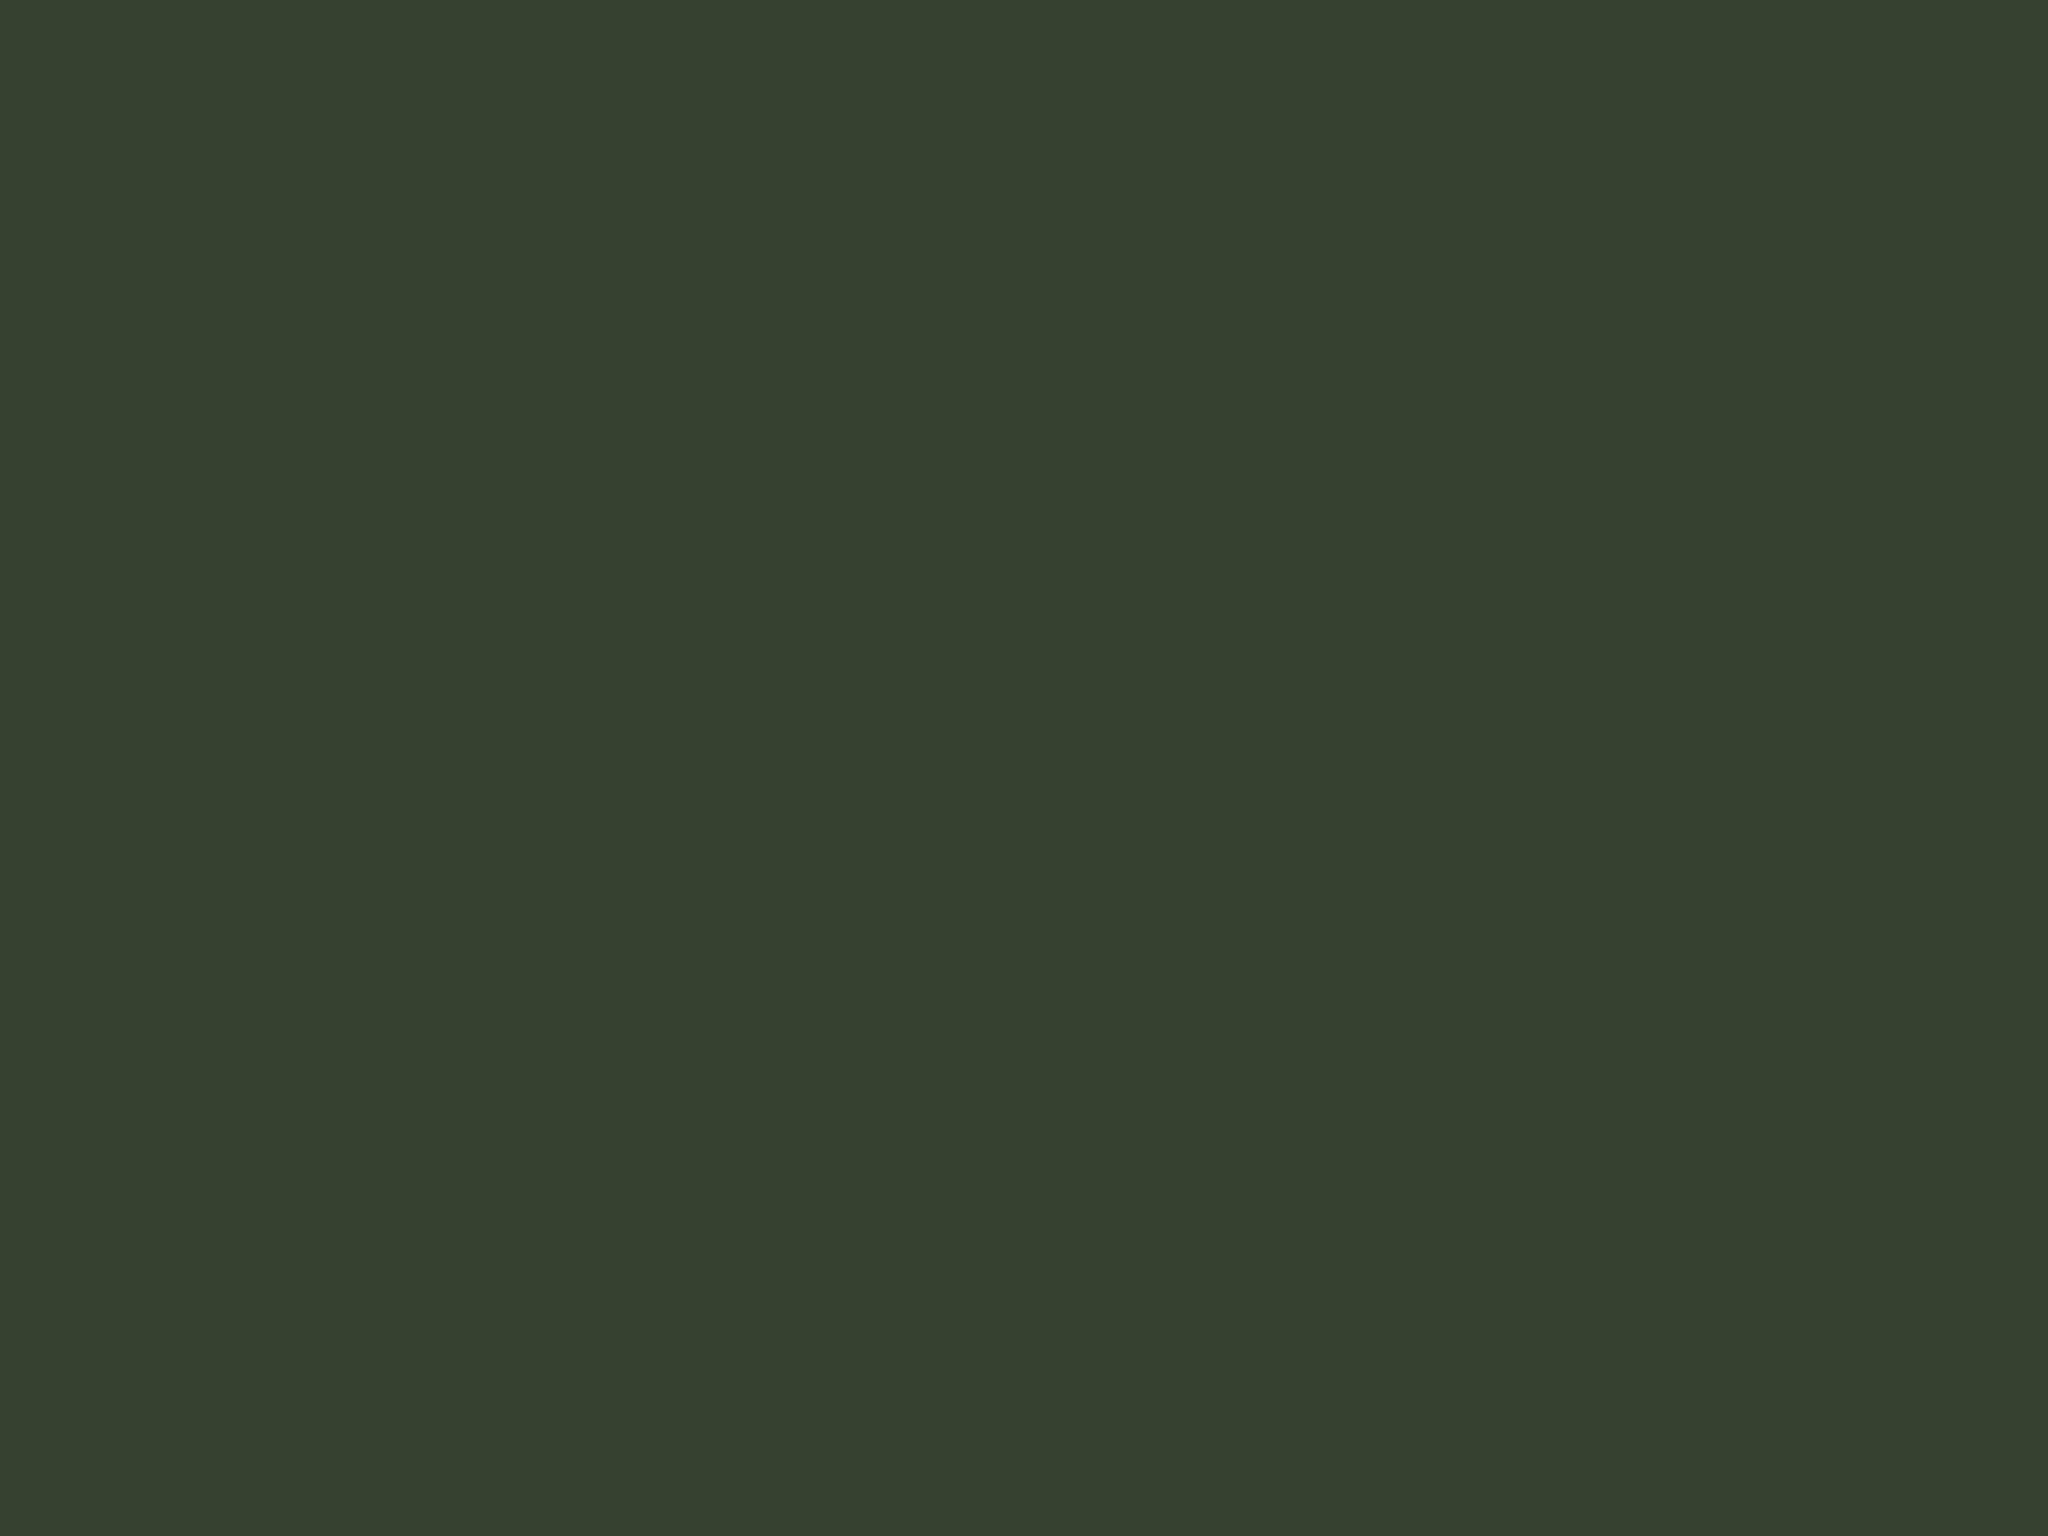 2048x1536 Kombu Green Solid Color Background